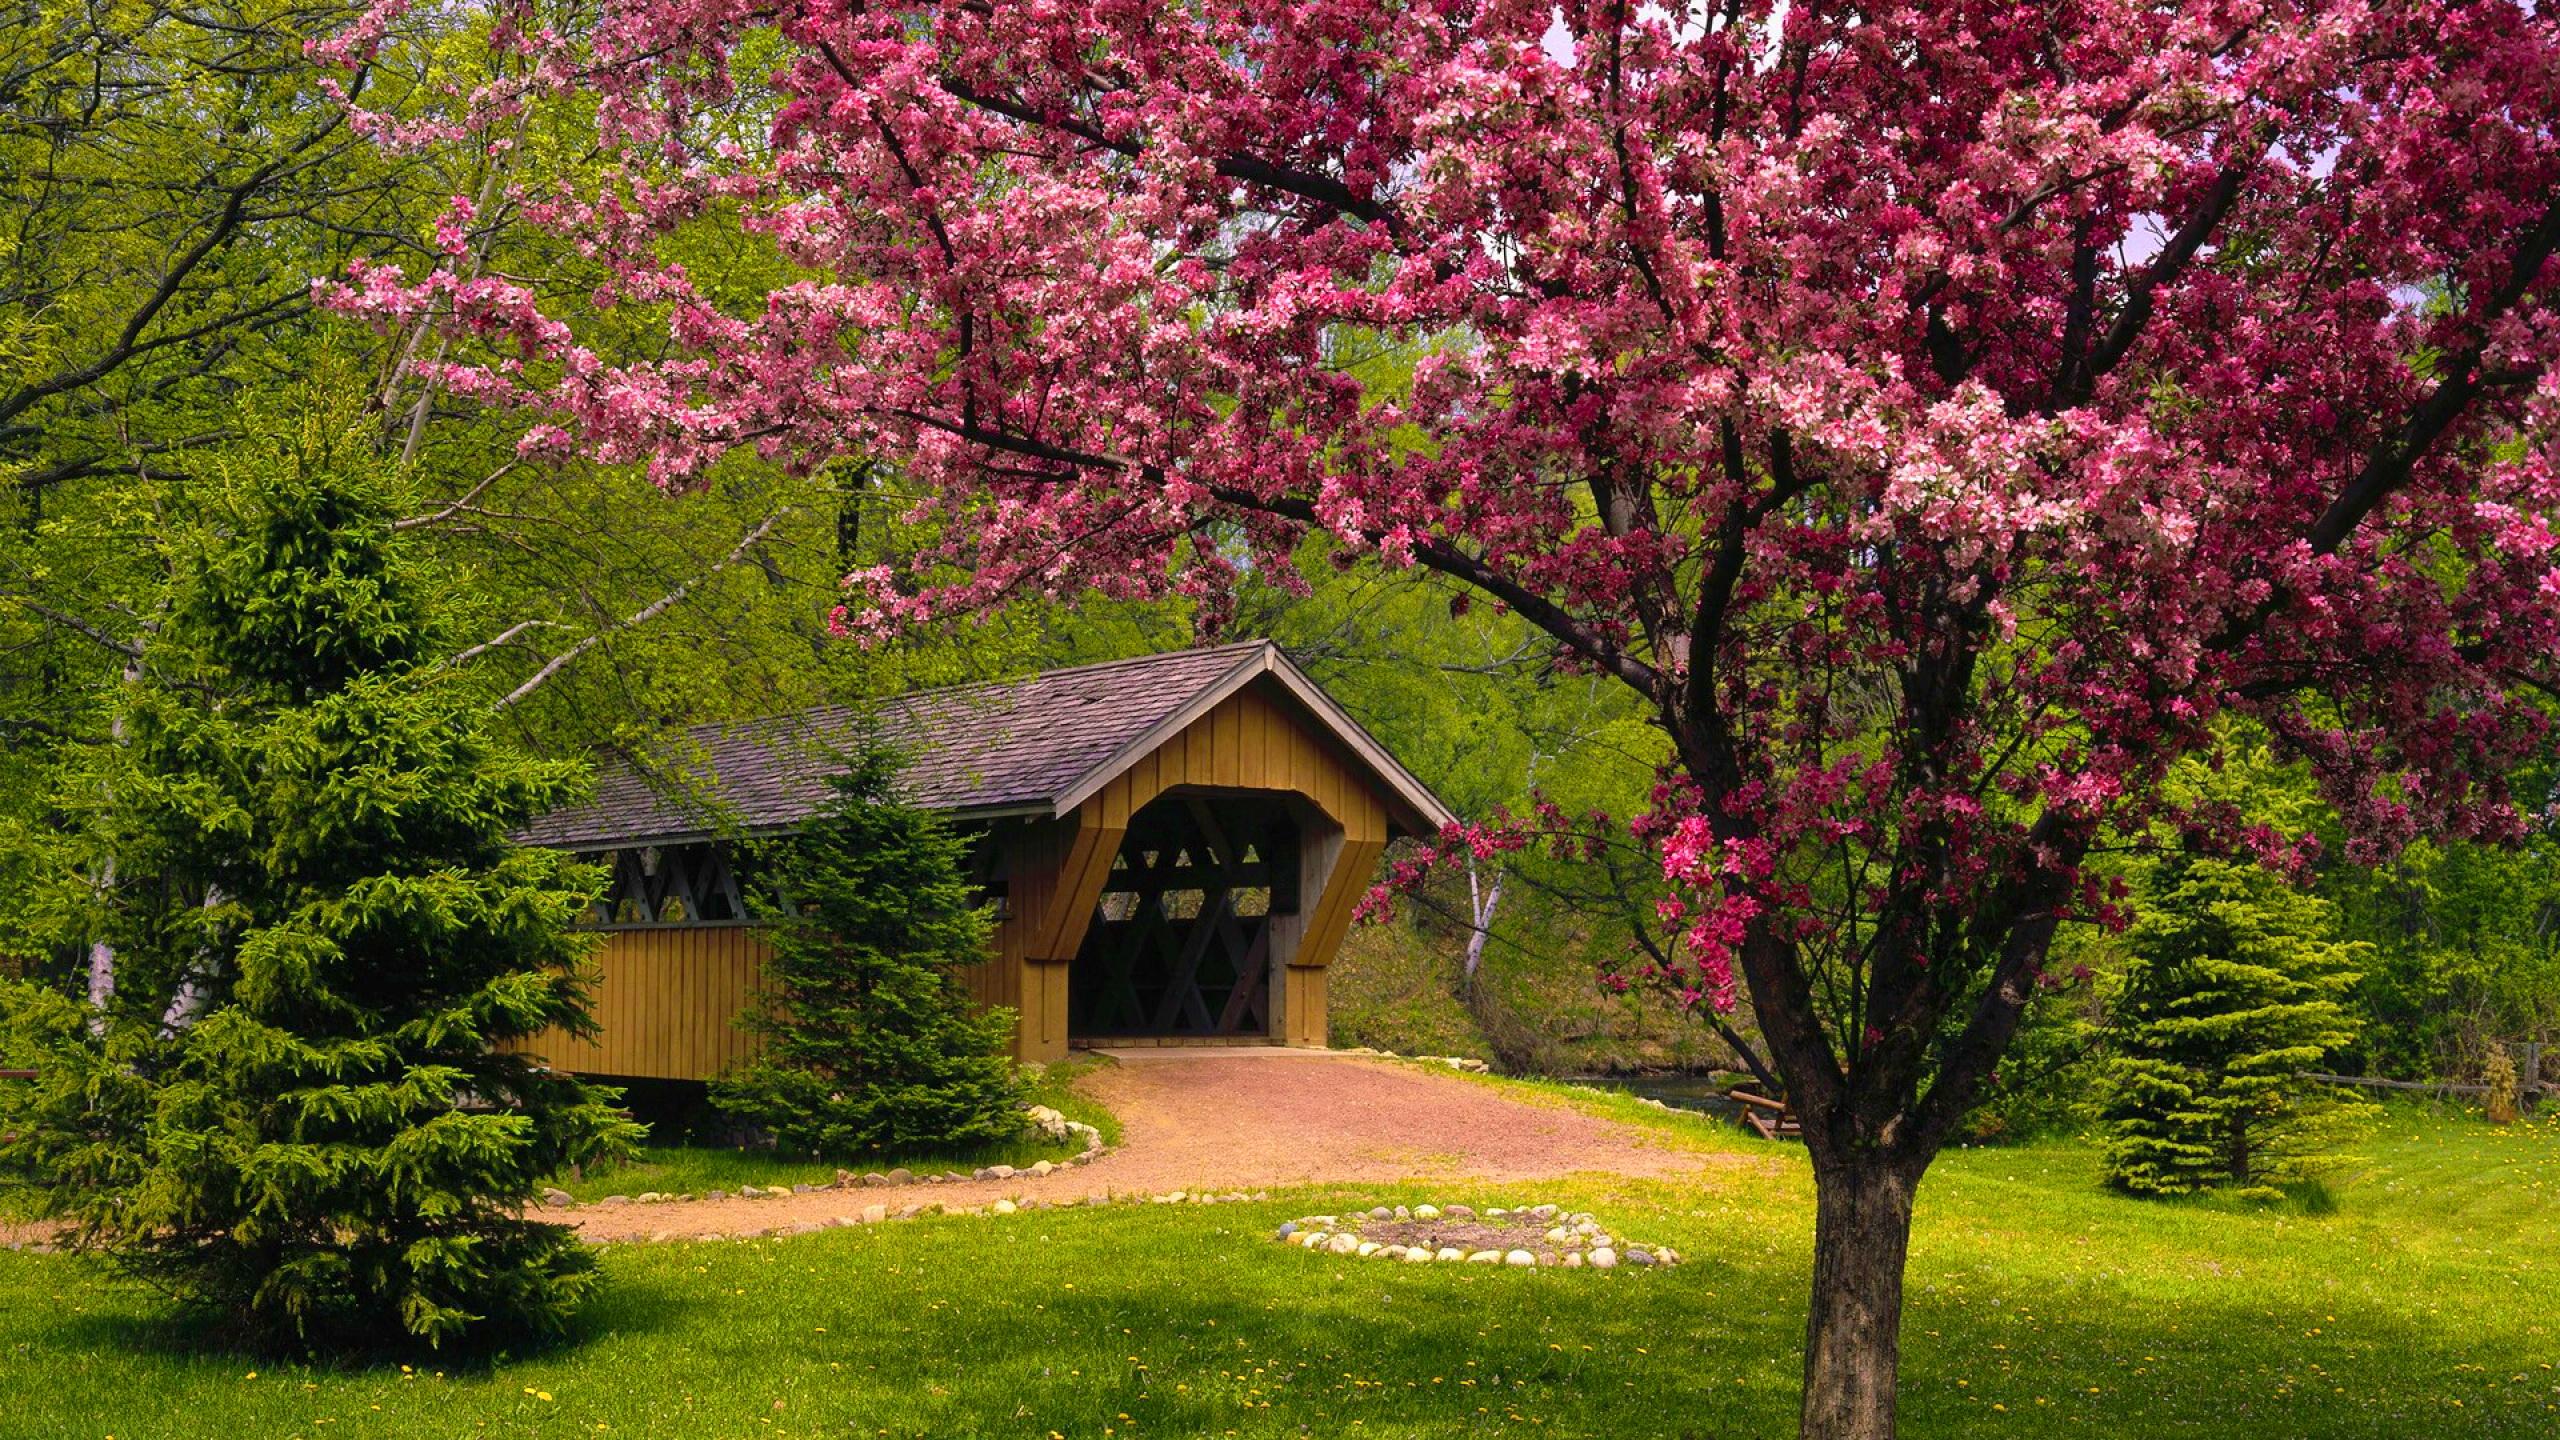 HD Wallpaper Spring season   httpwallpapermonkeycom 2560x1440